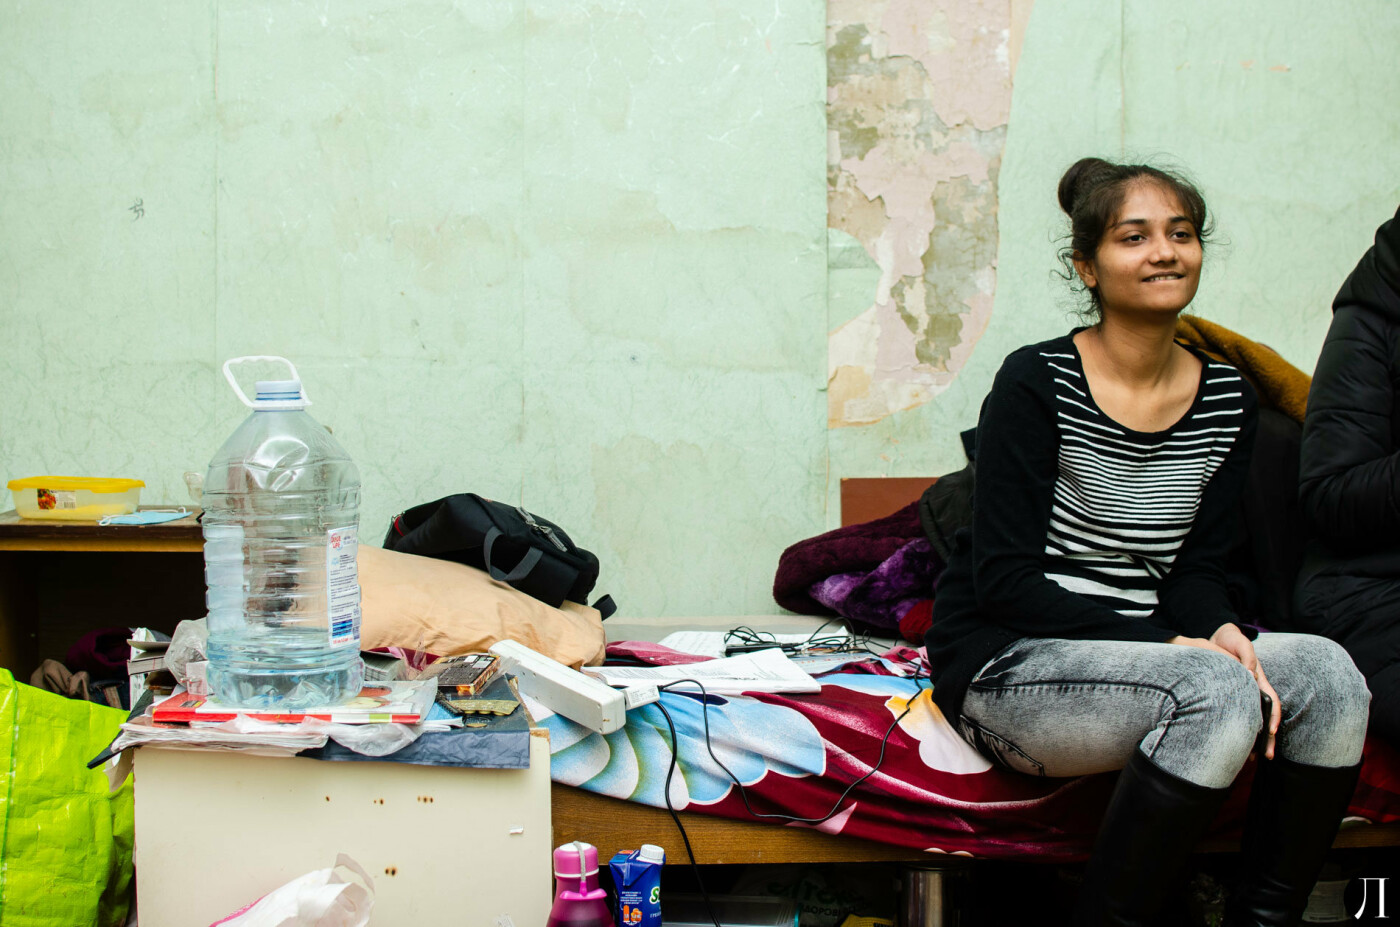 Памятник архитектуры в центре Одессы превратили в общежитие, - ФОТО, фото-6, Фото: Лоция